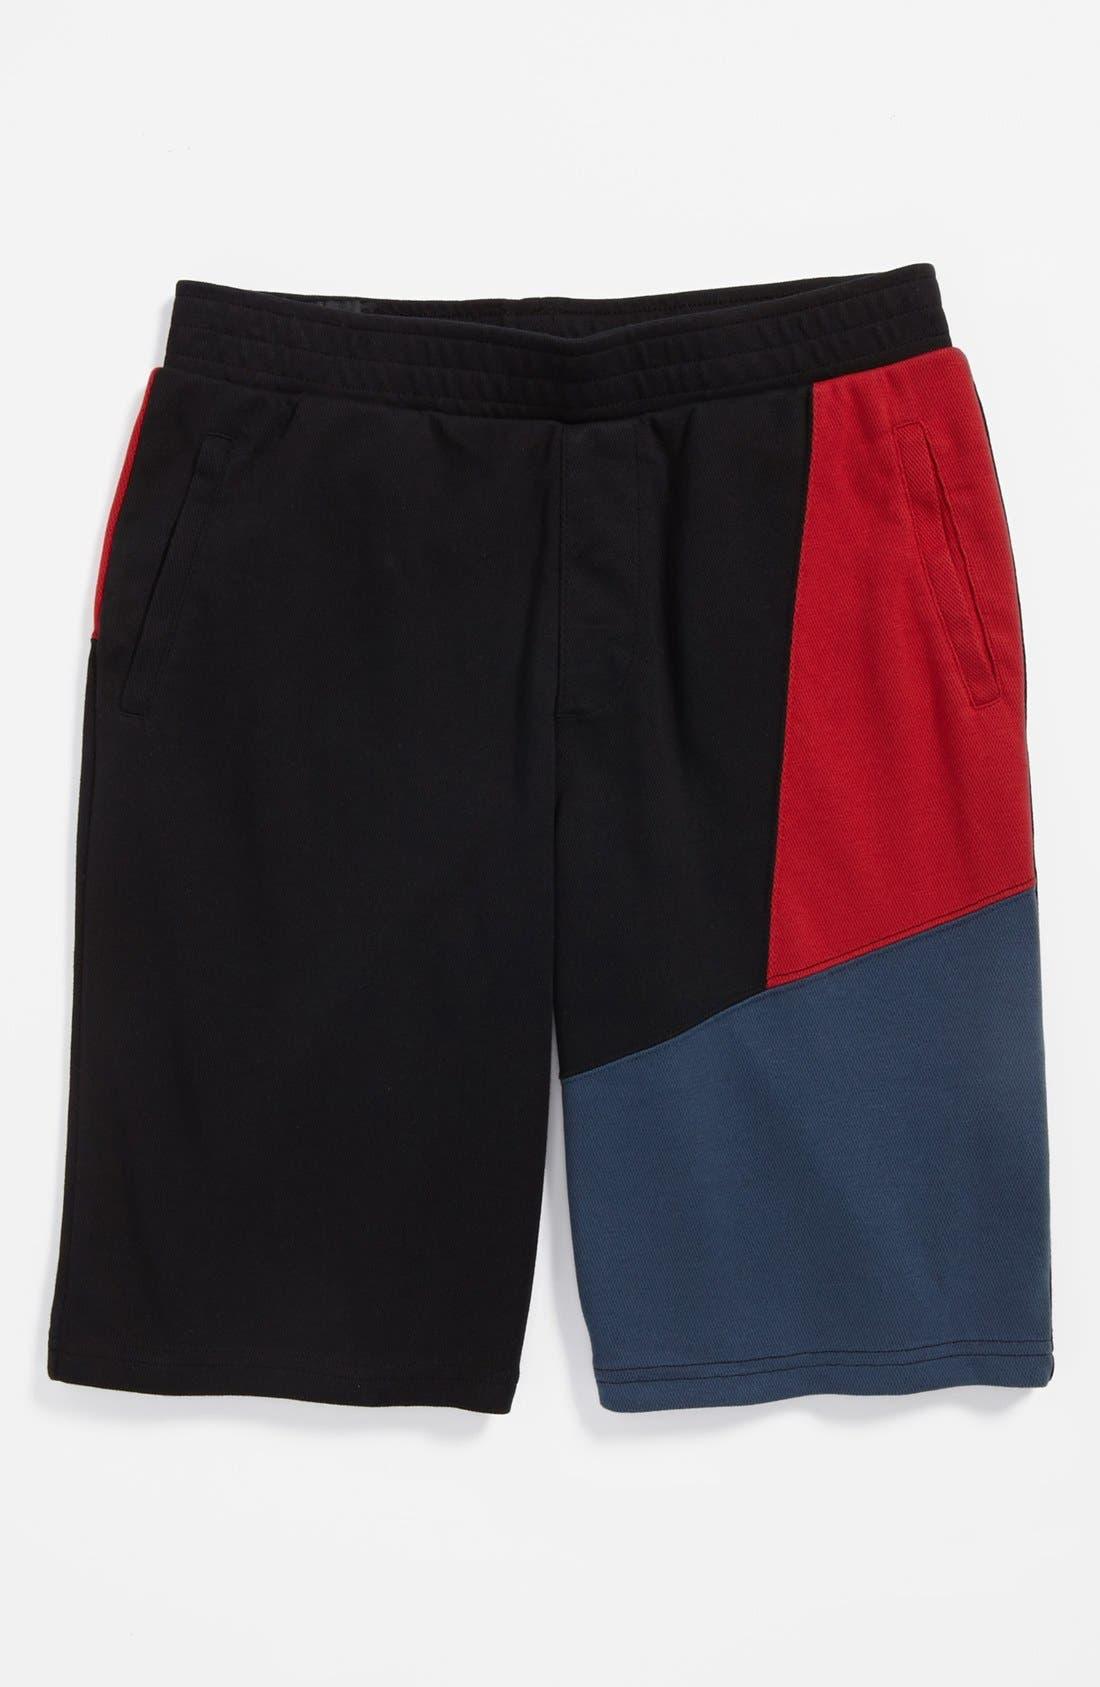 Main Image - Volcom 'Growler' Moisture Wicking Shorts (Little Boys & Big Boys)